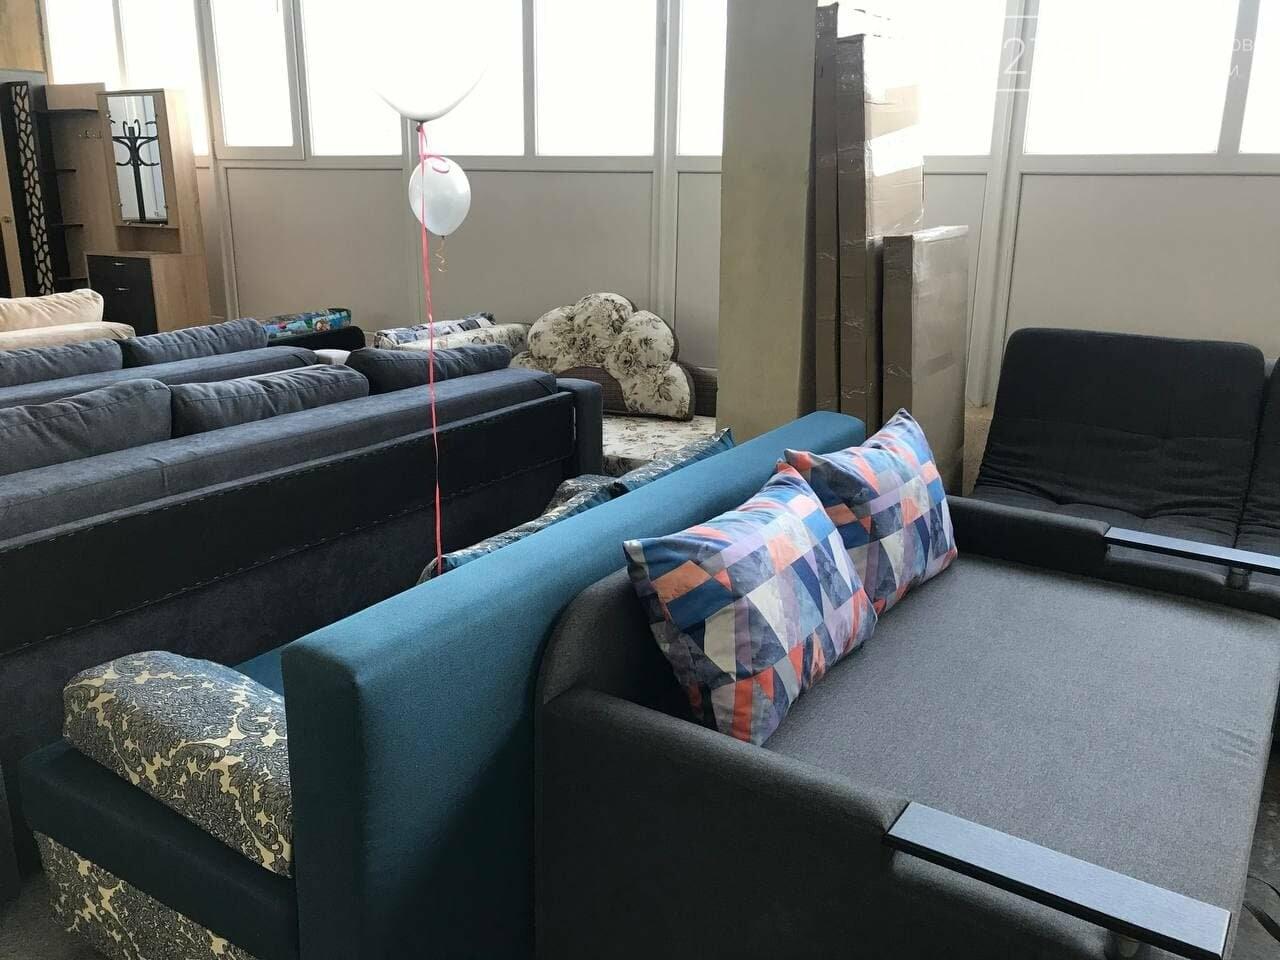 Магазин мебели в Курахово, Новости Курахово